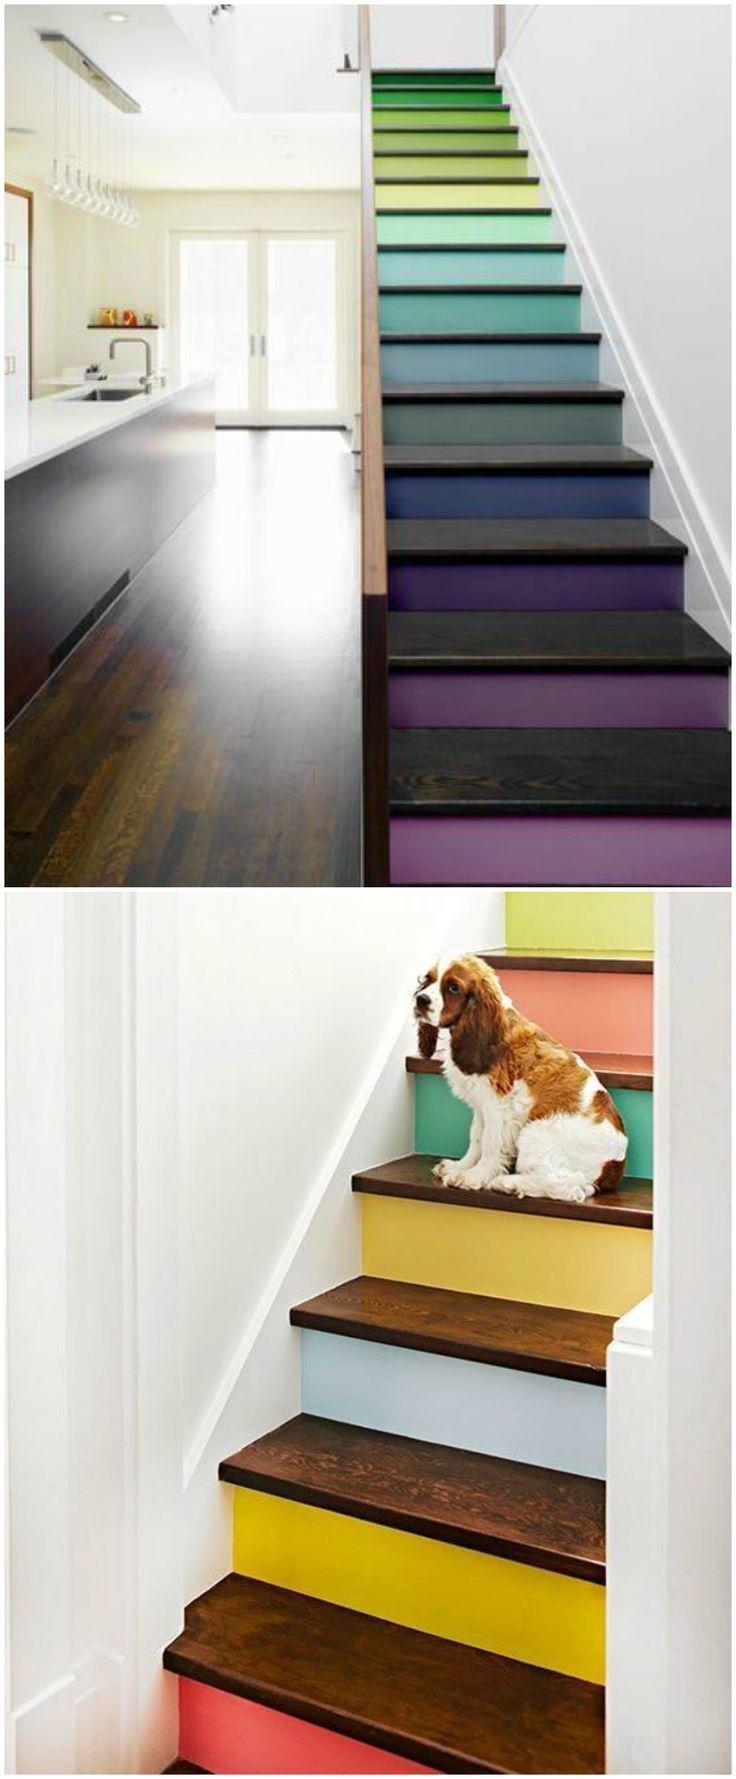 Las 25 mejores ideas sobre escaleras pintadas en pinterest for Escaleras de madera para pintor precios